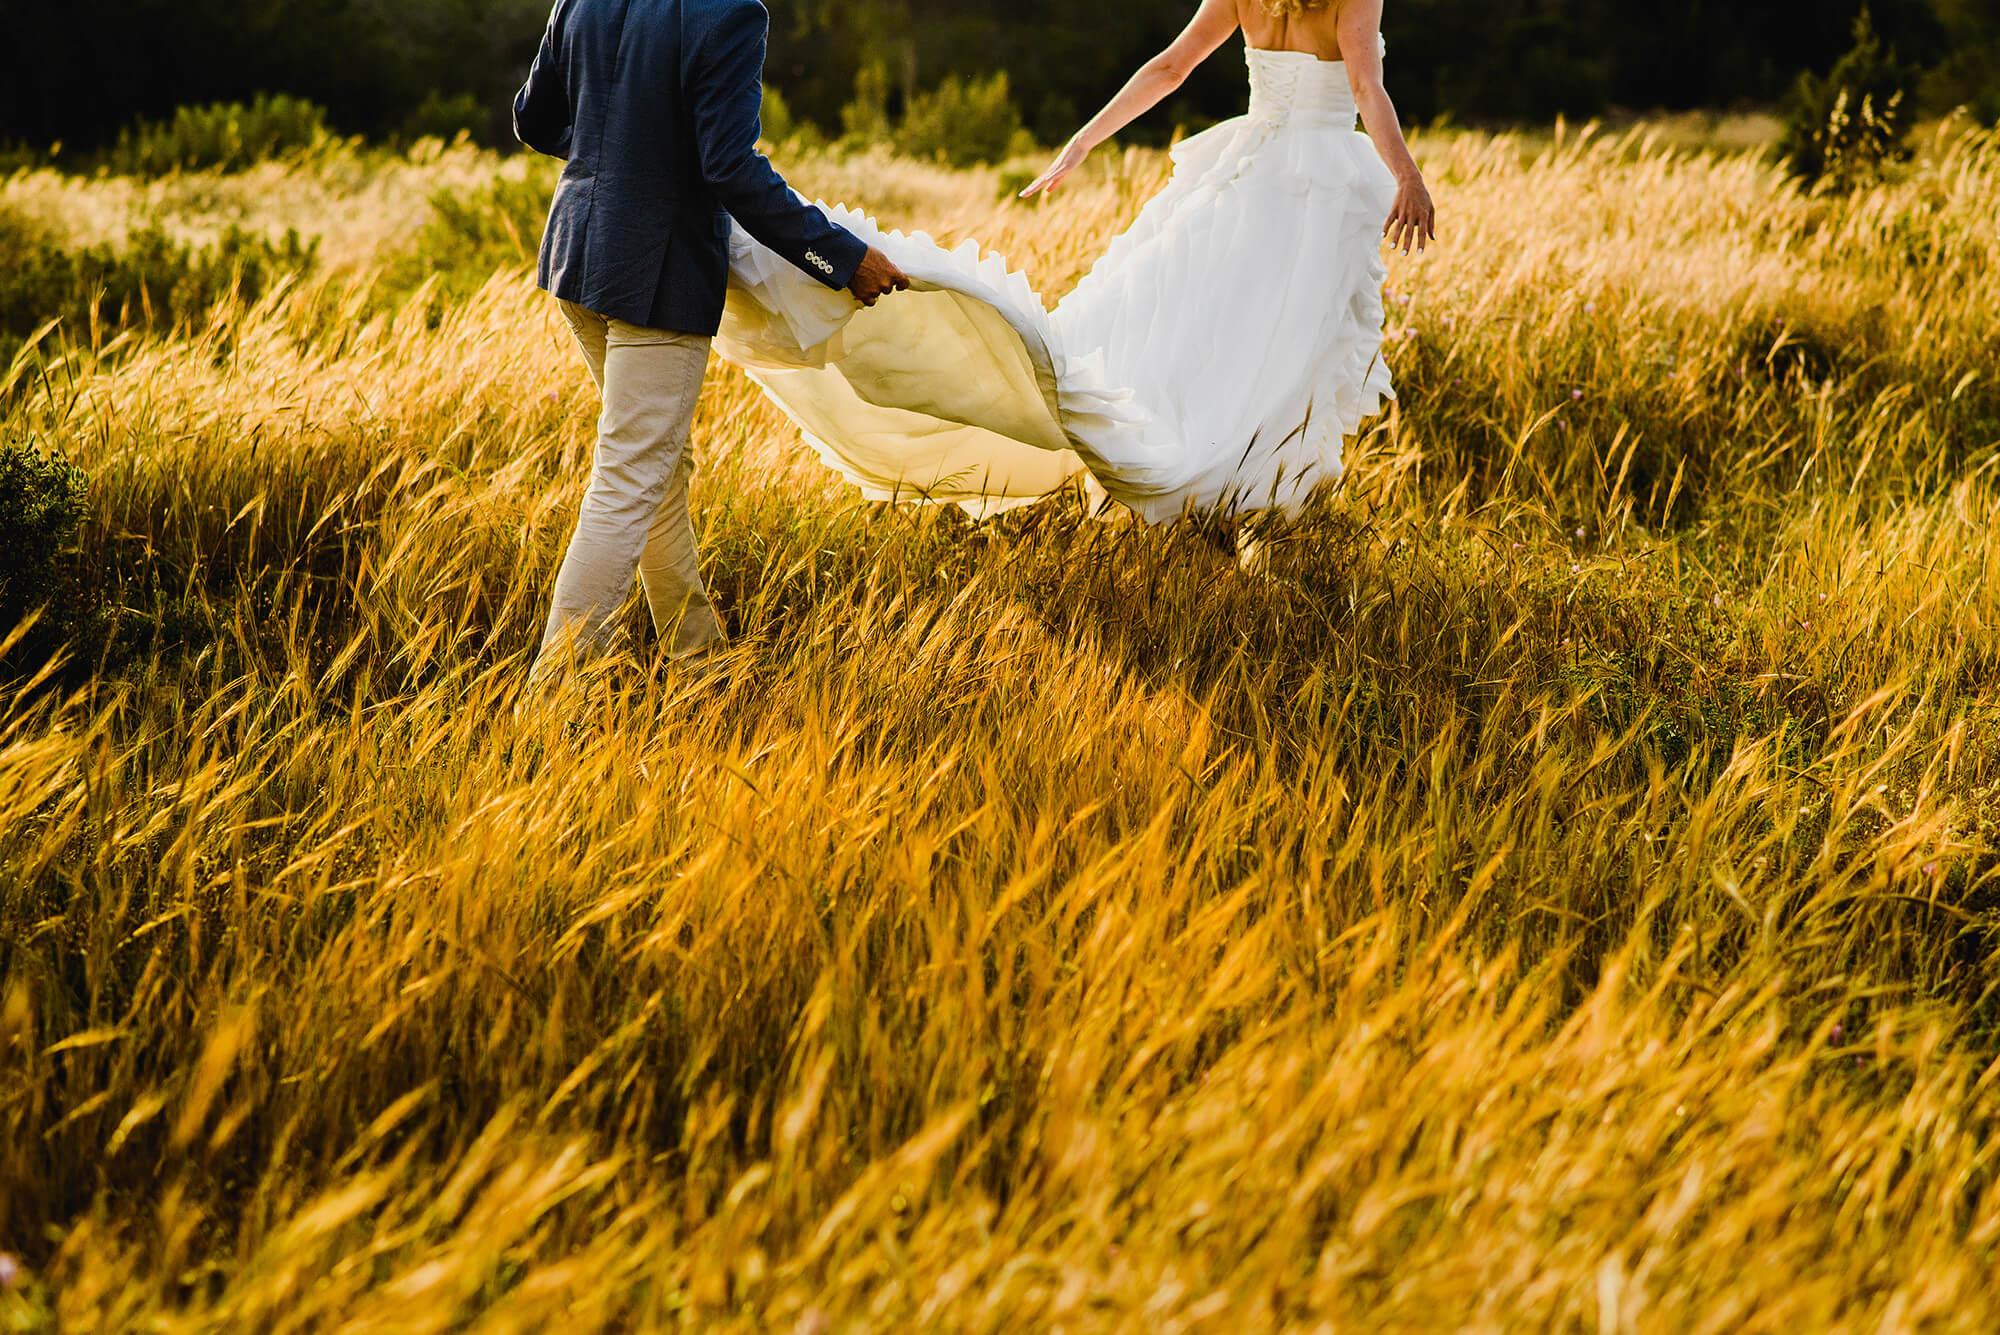 https://www.white-ibiza.com/wp-content/uploads/2020/03/white-ibiza-weddings-dario-sanz-photography-2020-07.jpg